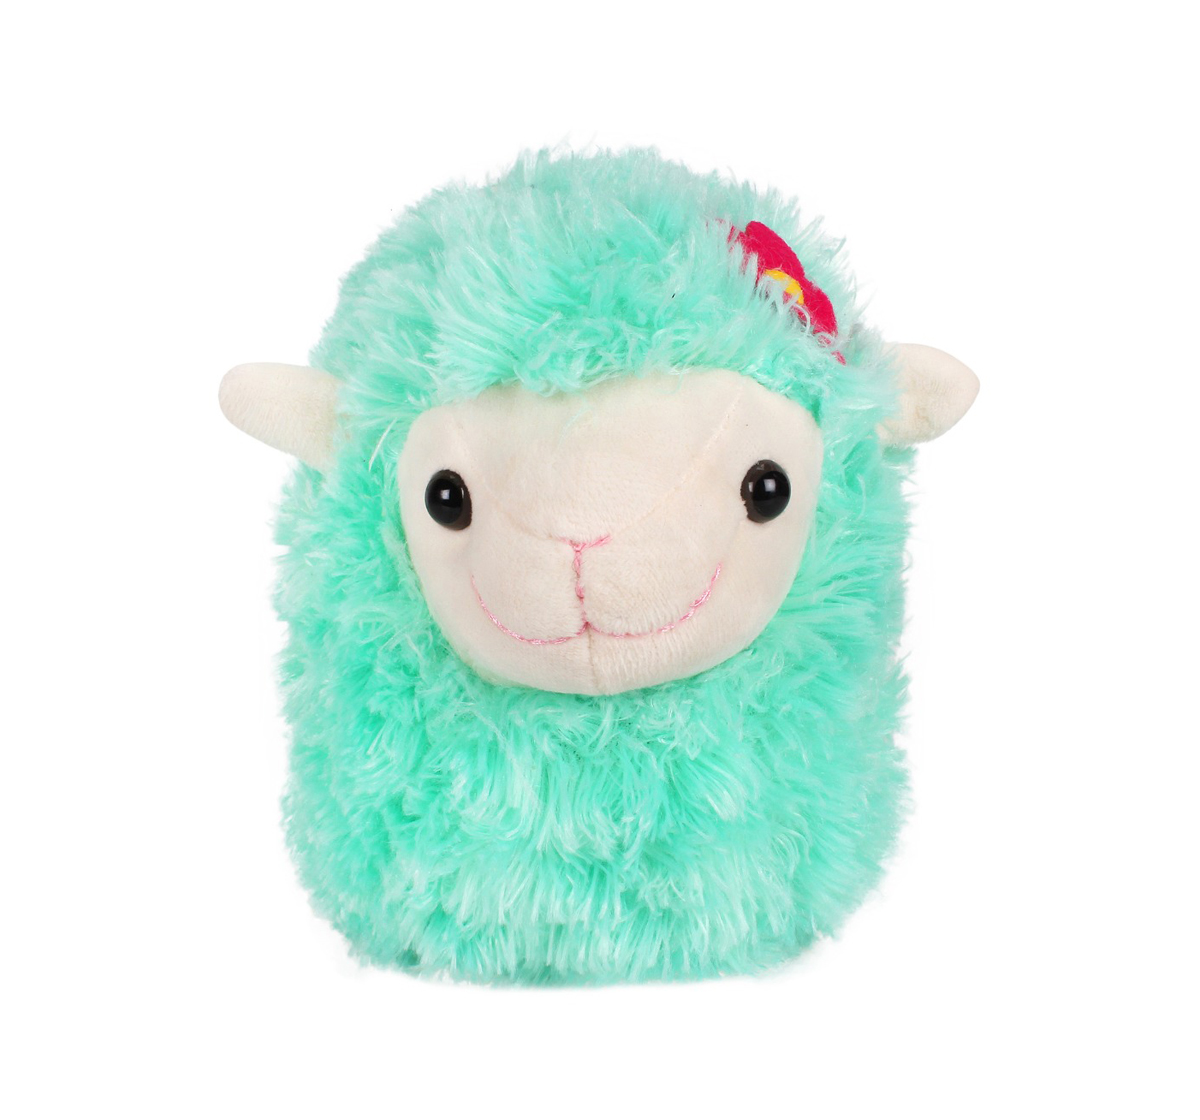 Fuzzbuzz | Fuzzbuzz Green Lamb Stuffed Animal - 28Cm Quirky Soft Toys for Kids age 0M+ - 20 Cm (Green)